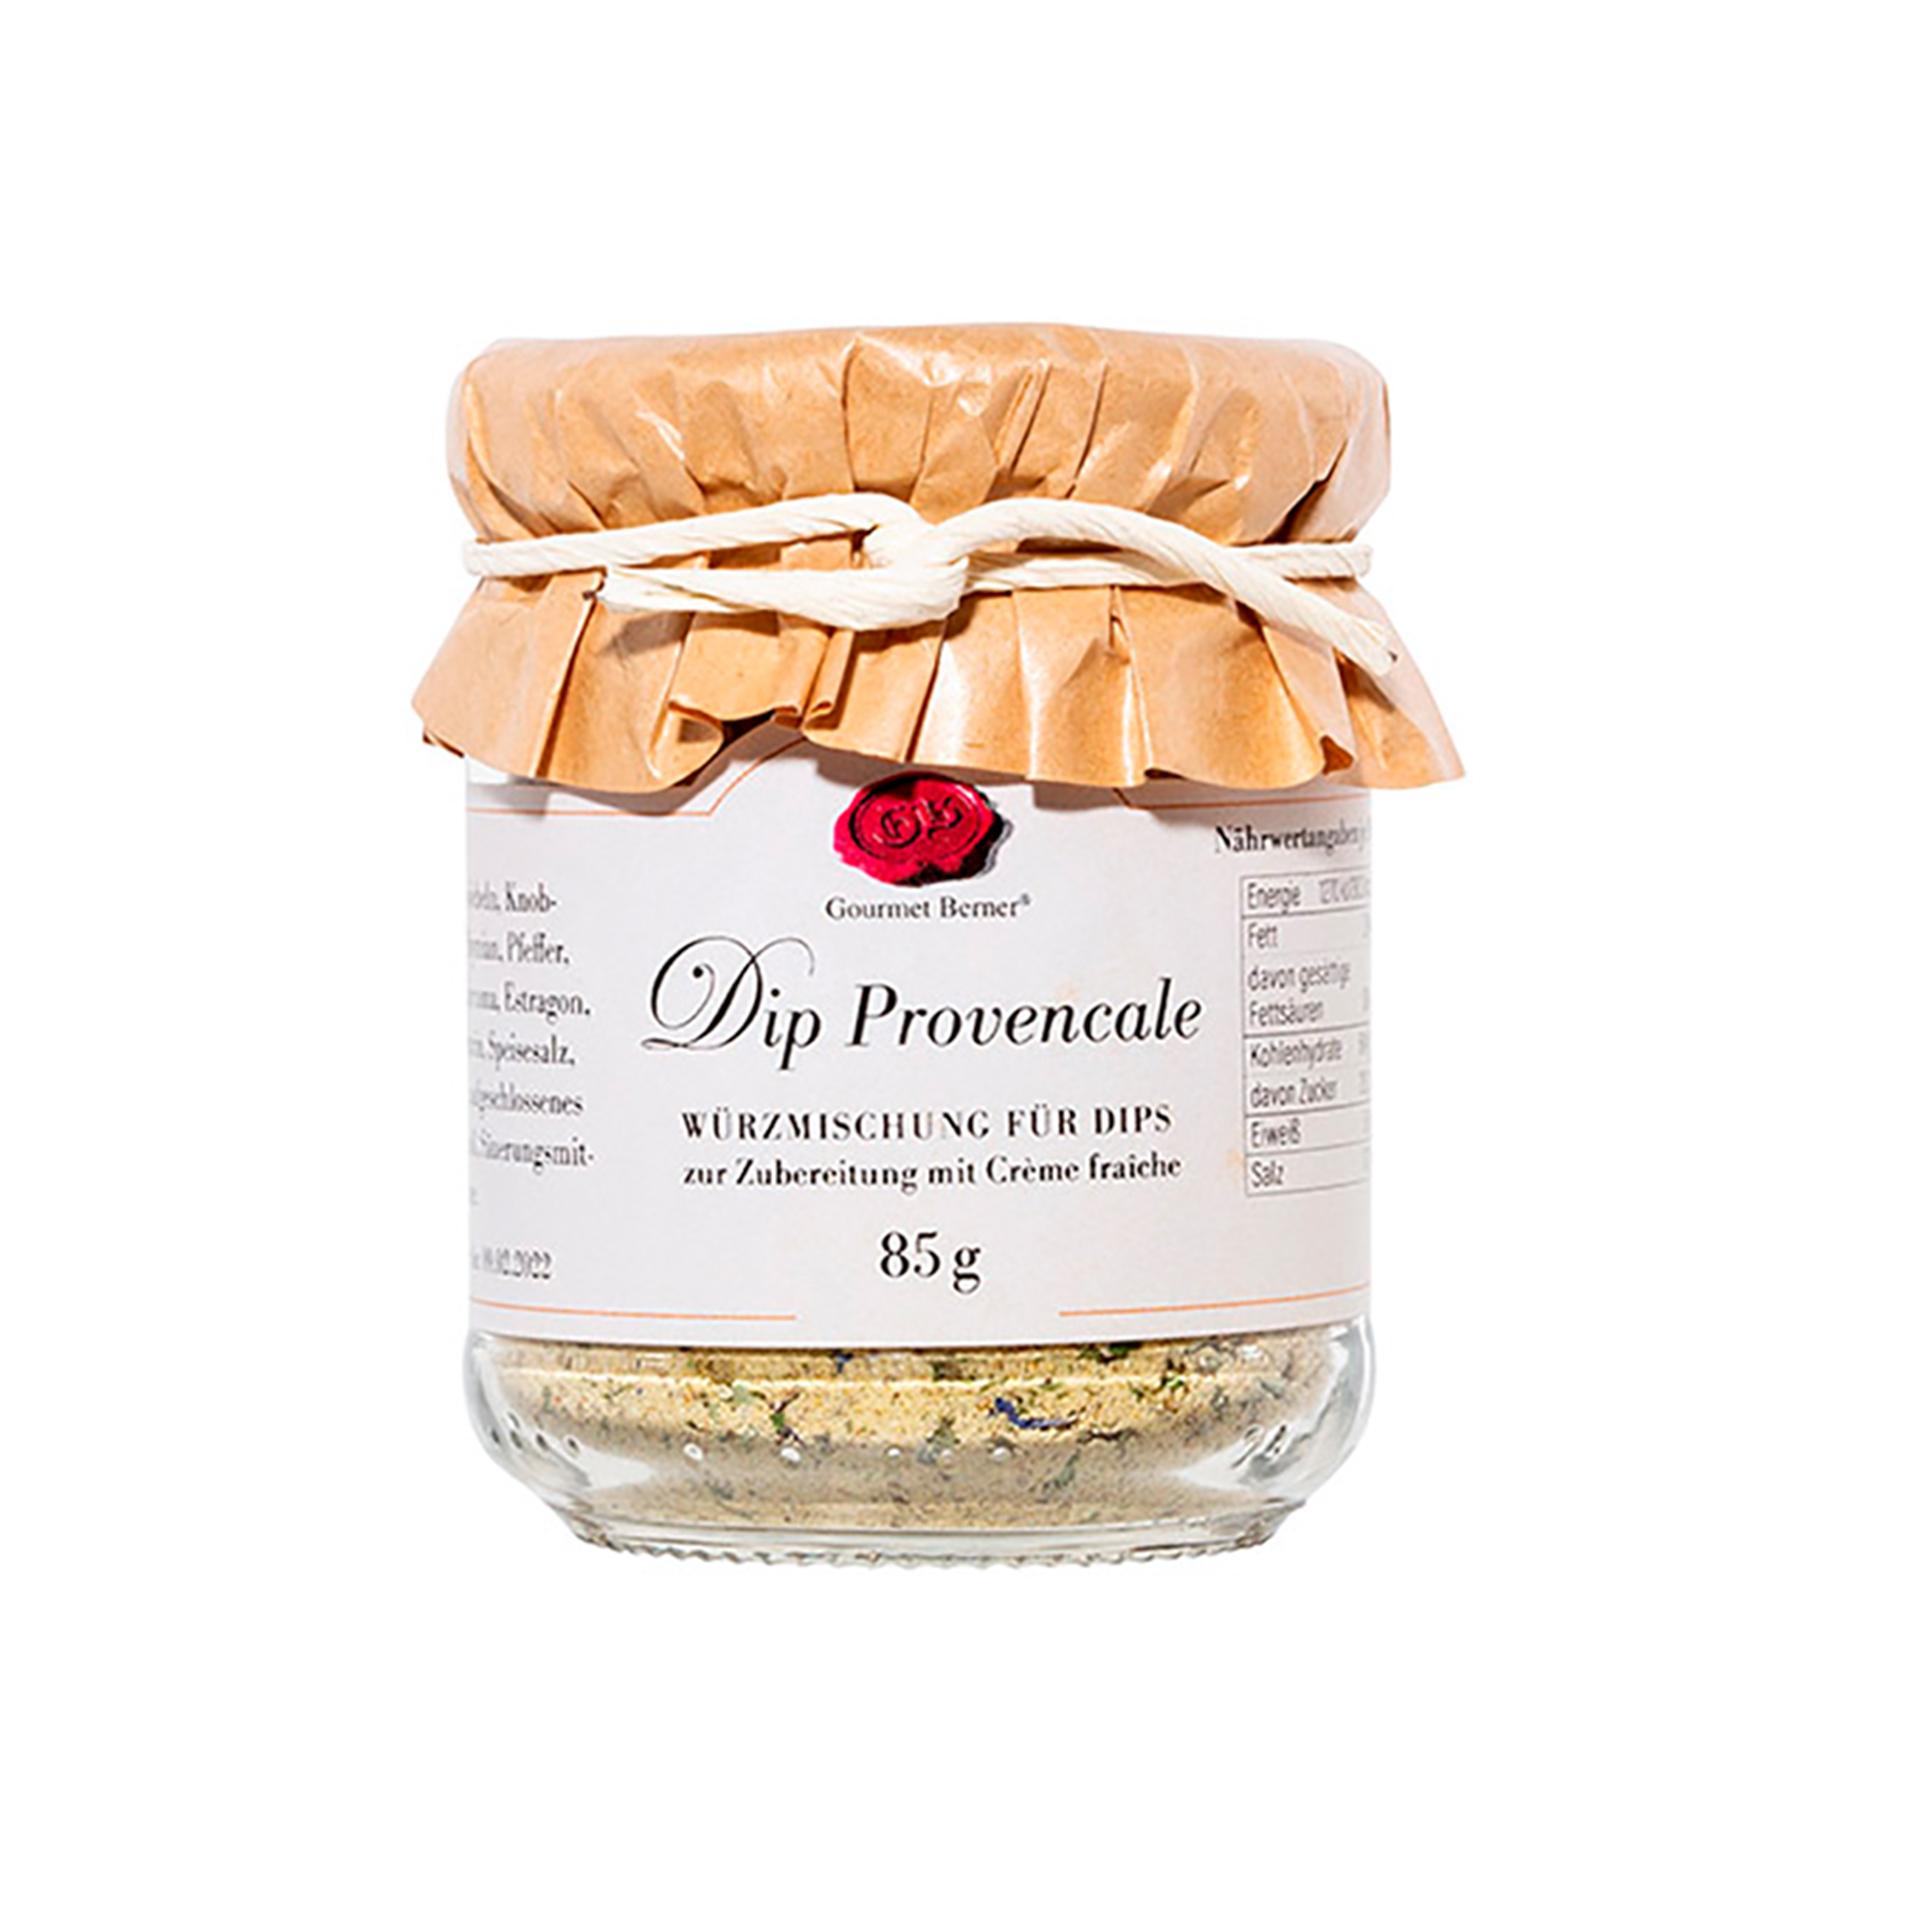 Gourmet Berner - Dip Provencale, 85g Glas